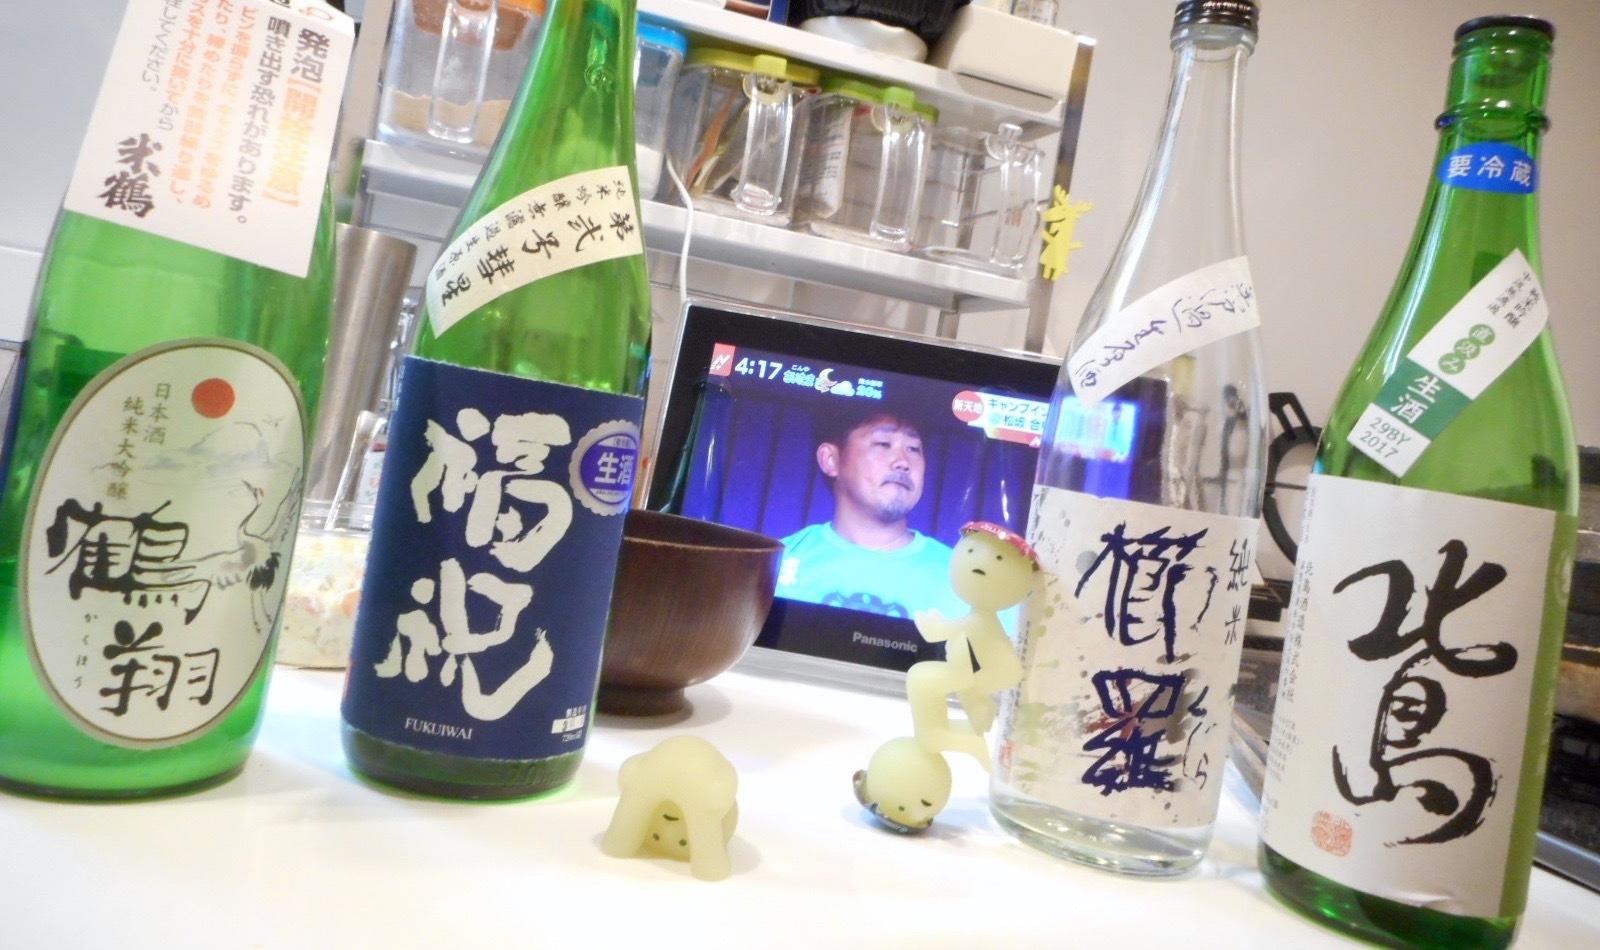 kujira_junmai29by9.jpg